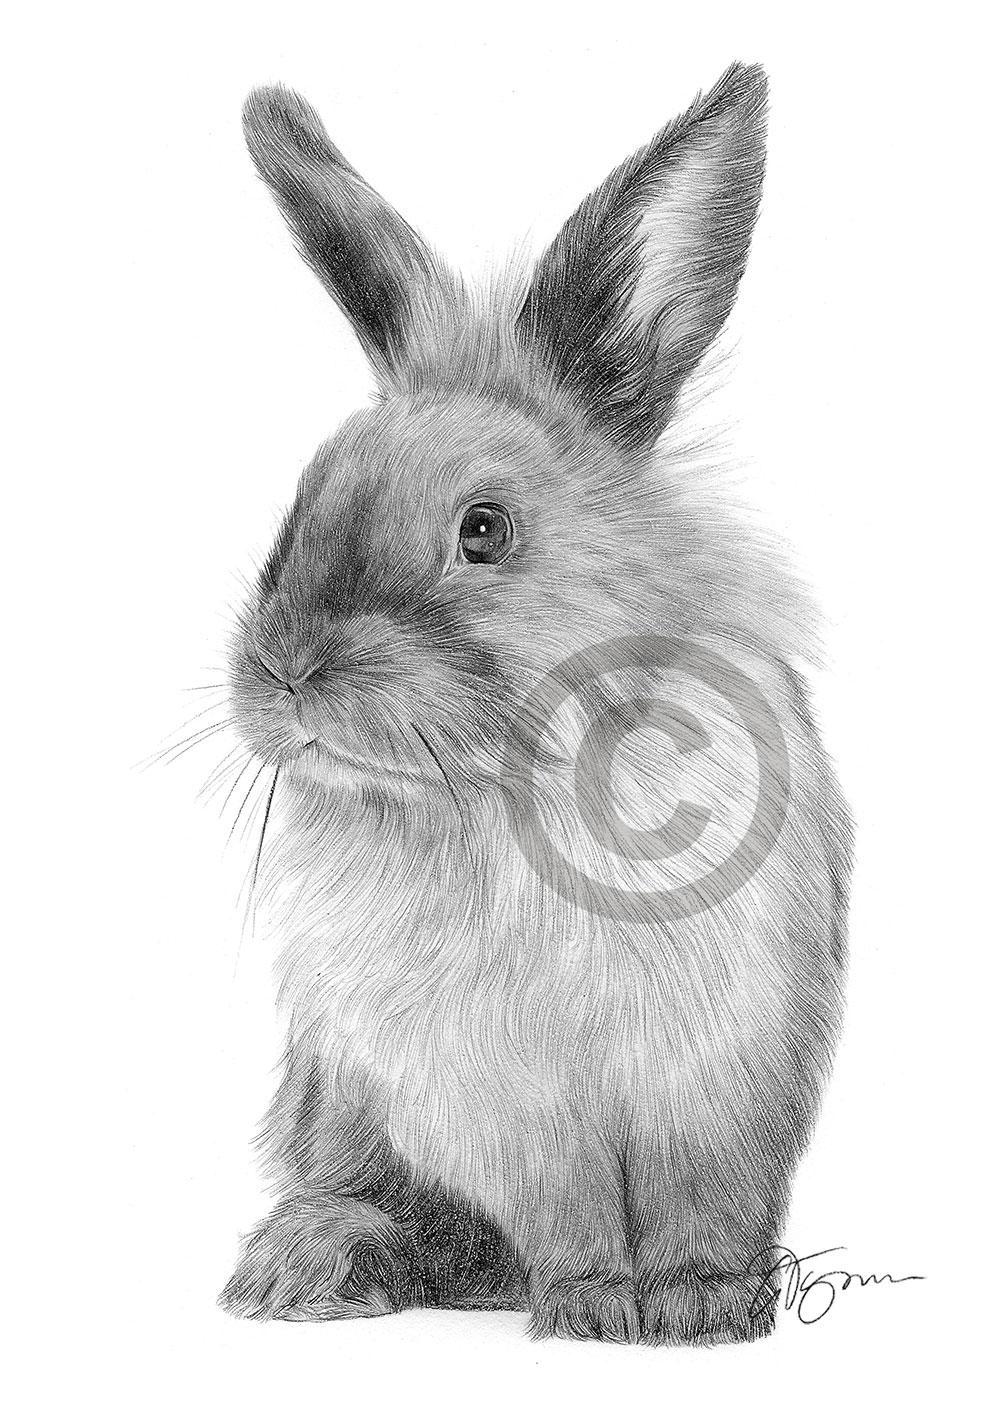 Pencil drawing of a rabbit